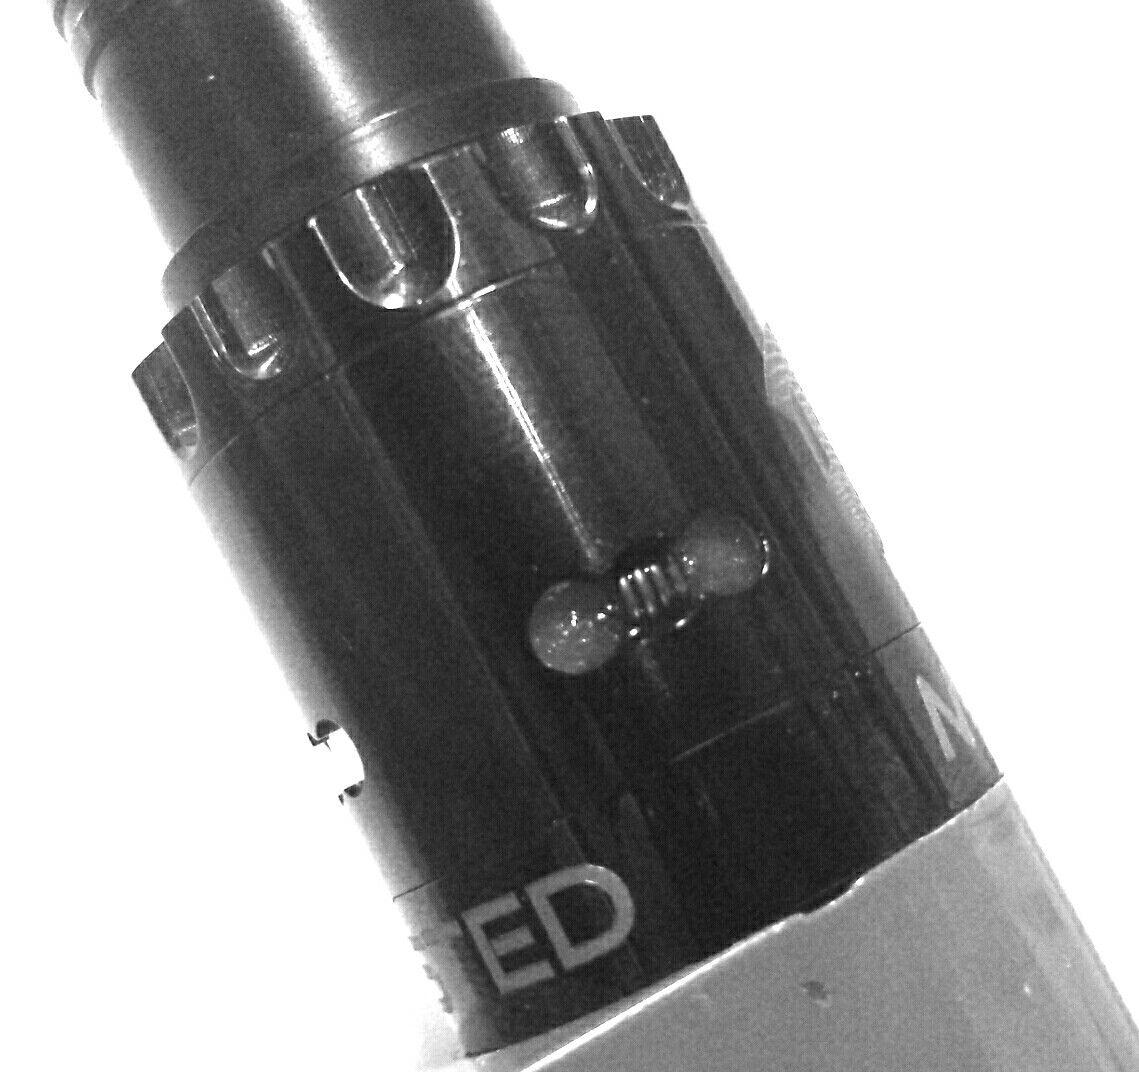 Dam Near Perfect Vape coils, Vape, Telescope